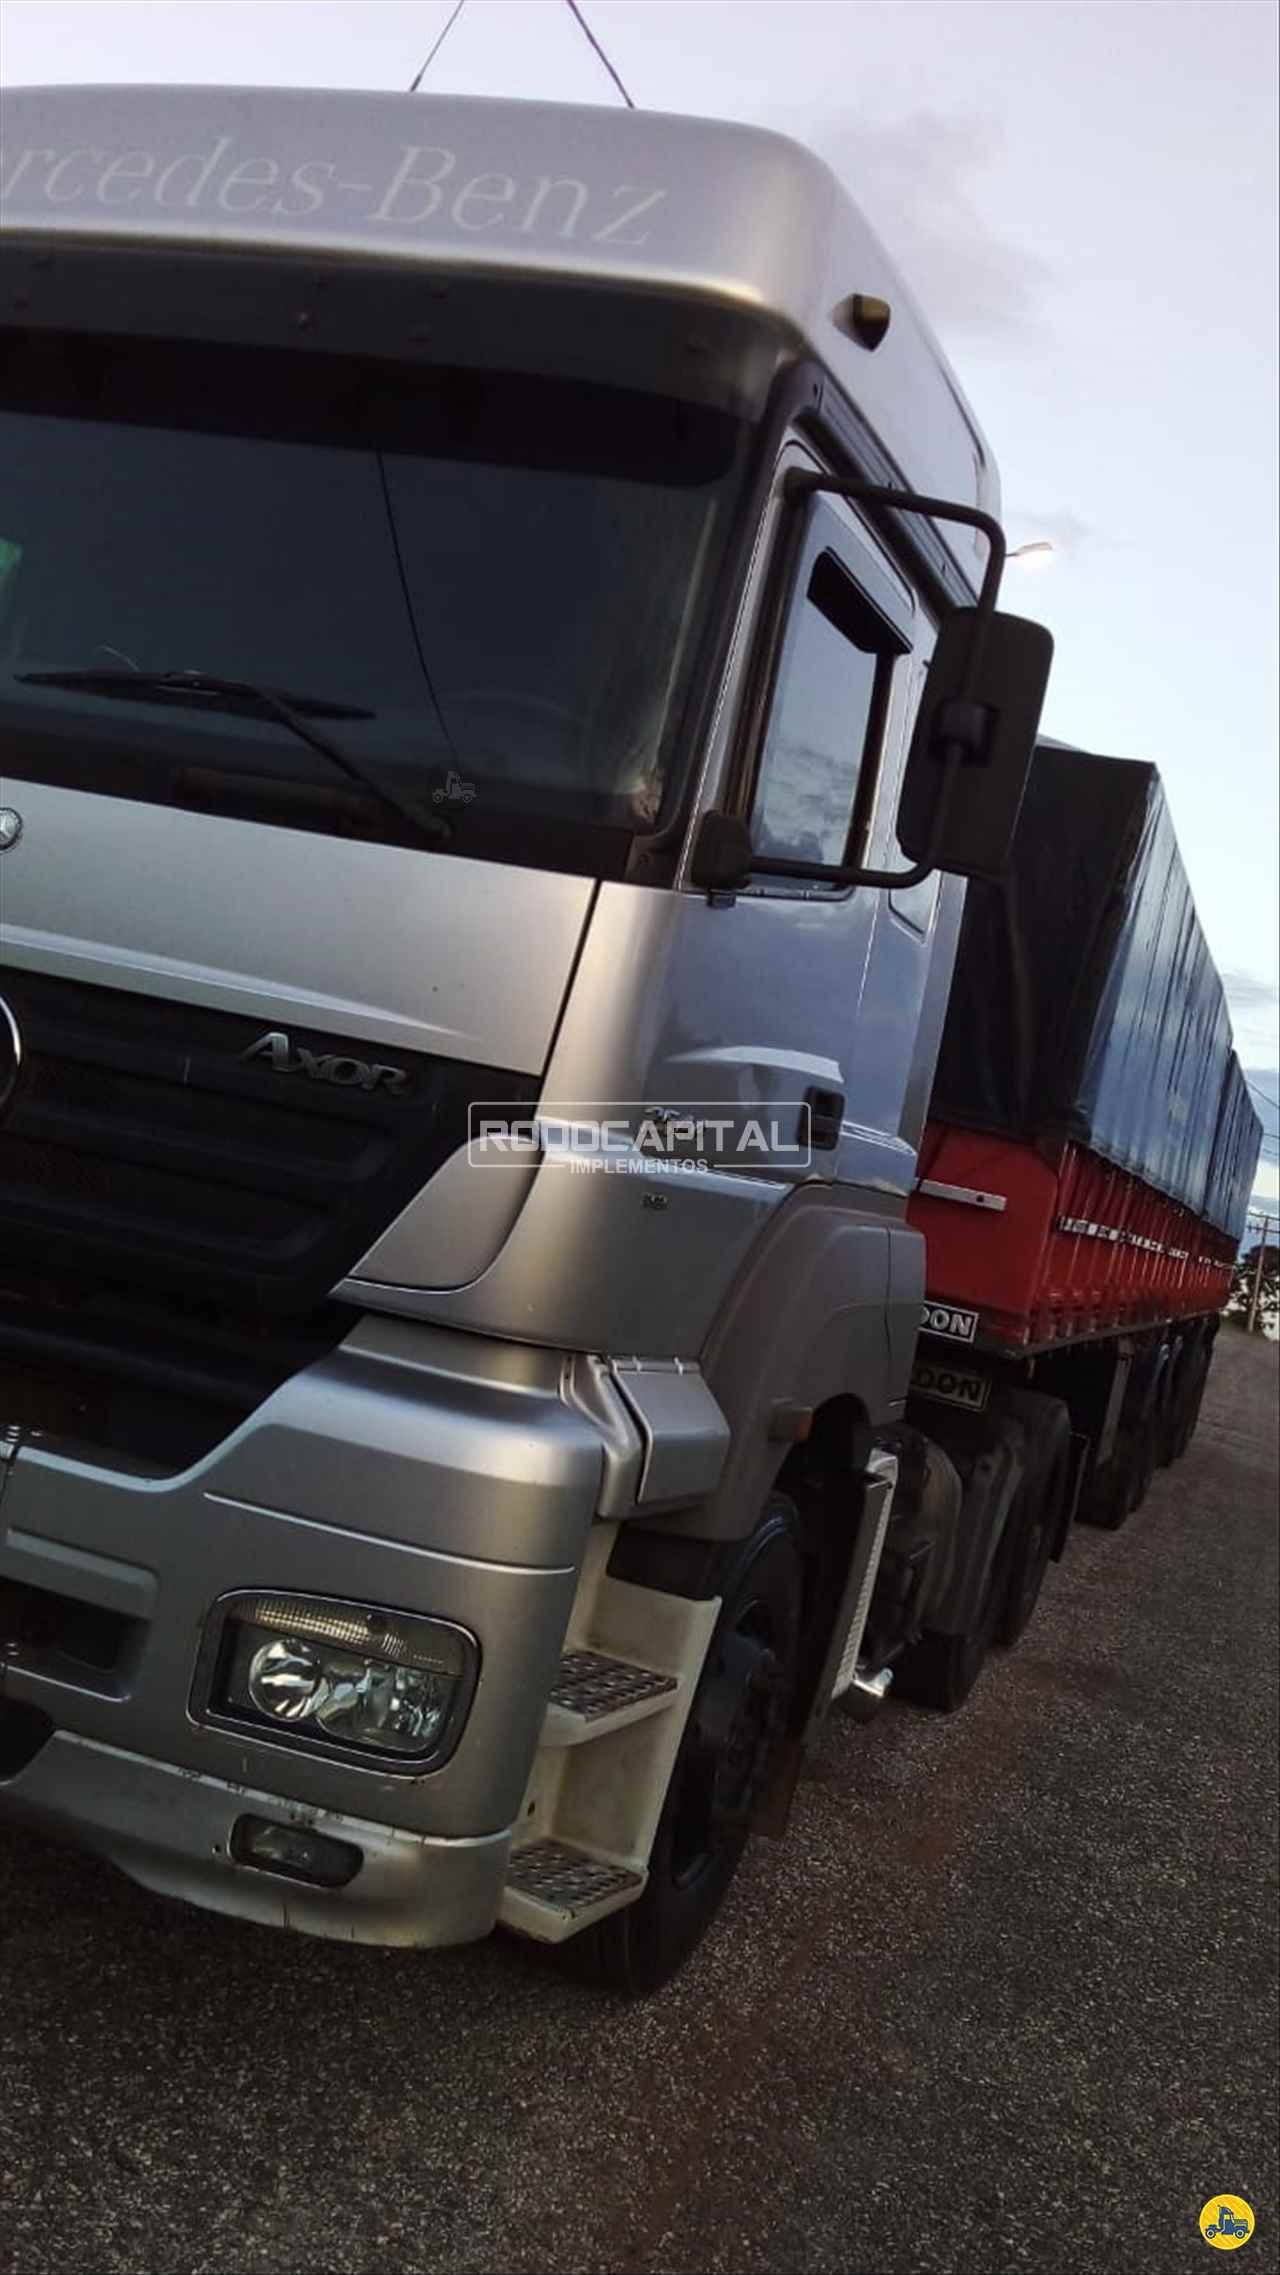 CAMINHAO MERCEDES-BENZ MB 2544 Cavalo Mecânico Truck 6x2 RODOCAPITAL - TRUCKVAN BRASILIA DISTRITO FEDERAL DF